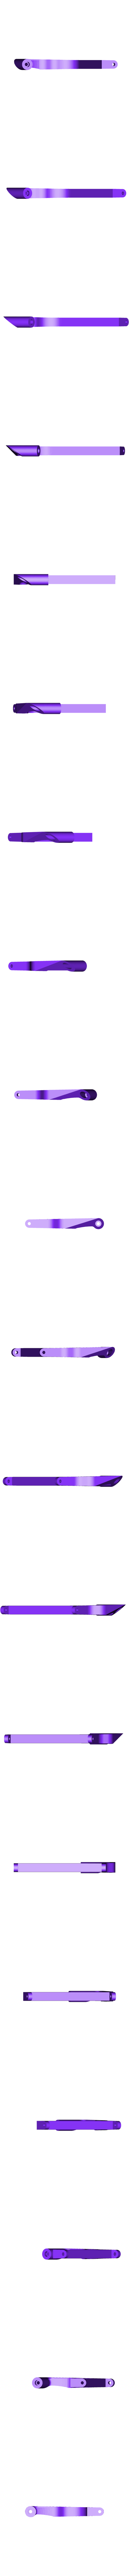 newservoarm.stl Download free STL file Additional parts to the iron man's helmet mark 42 • 3D printable template, SKUPERDIY